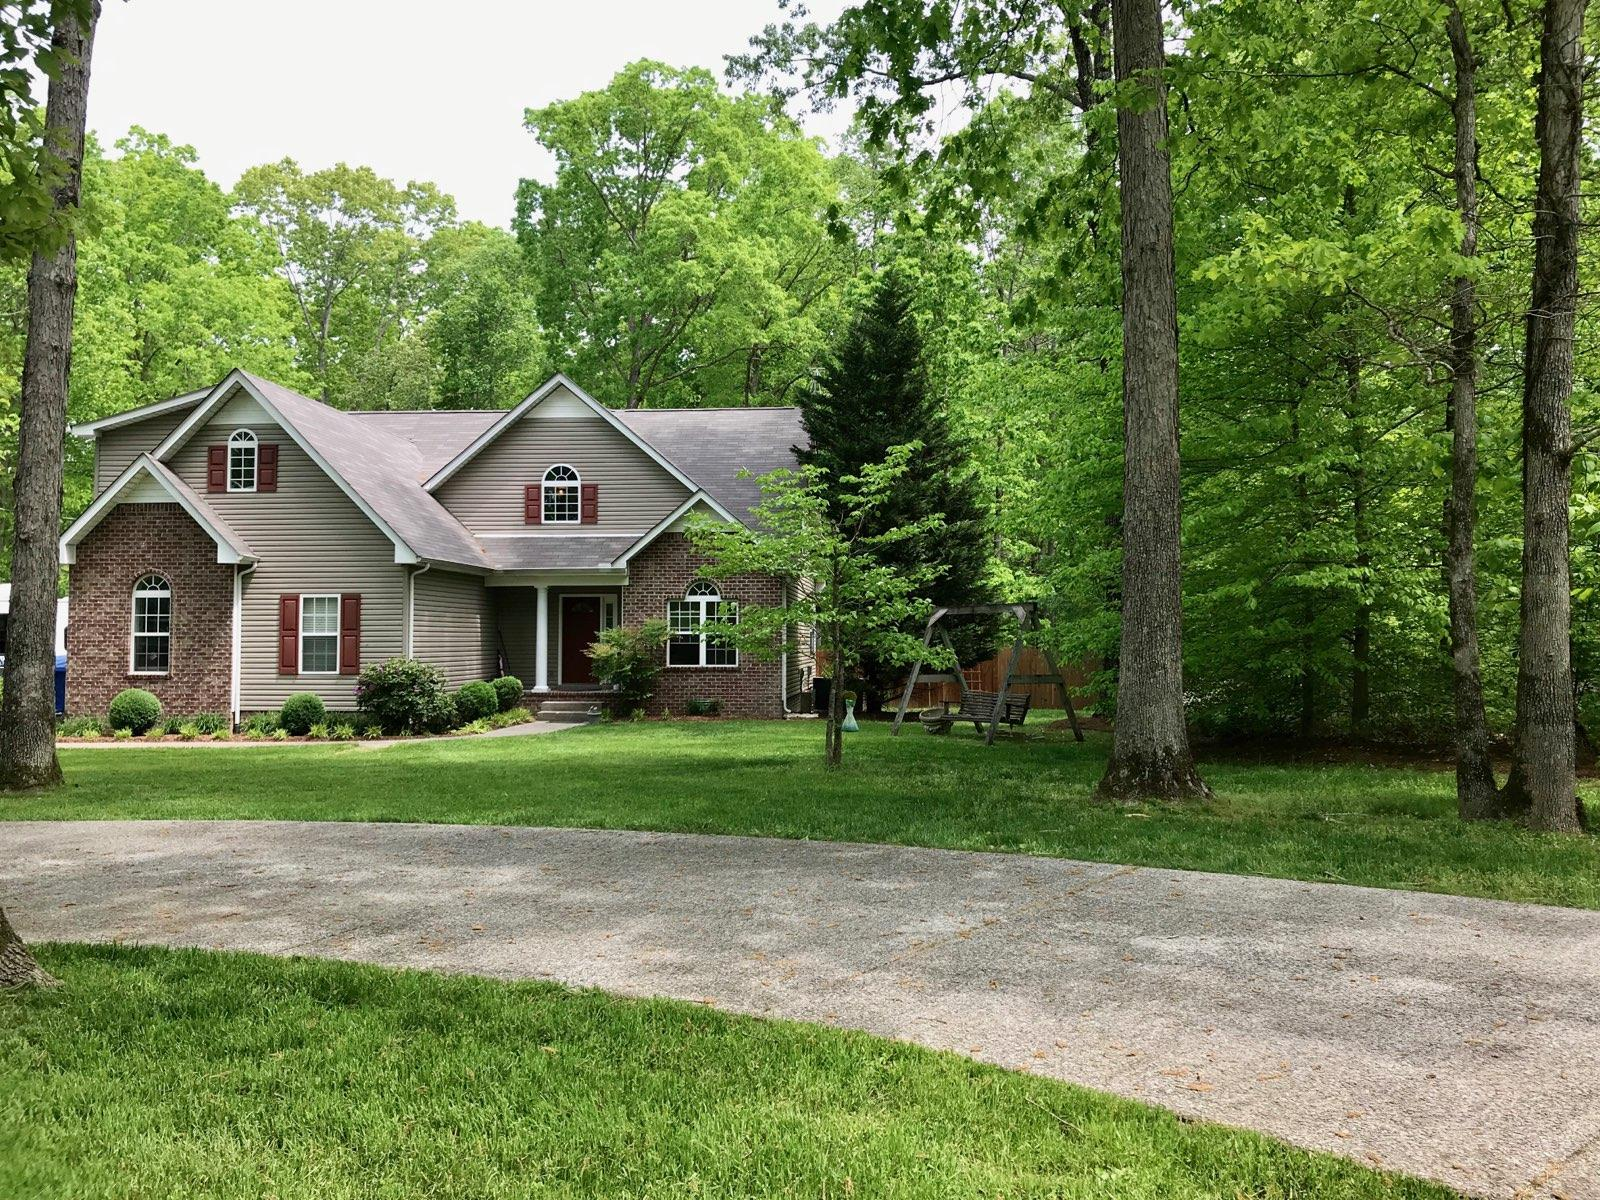 1208 Wildlife Trl, Kingston Springs, TN 37082 - Kingston Springs, TN real estate listing